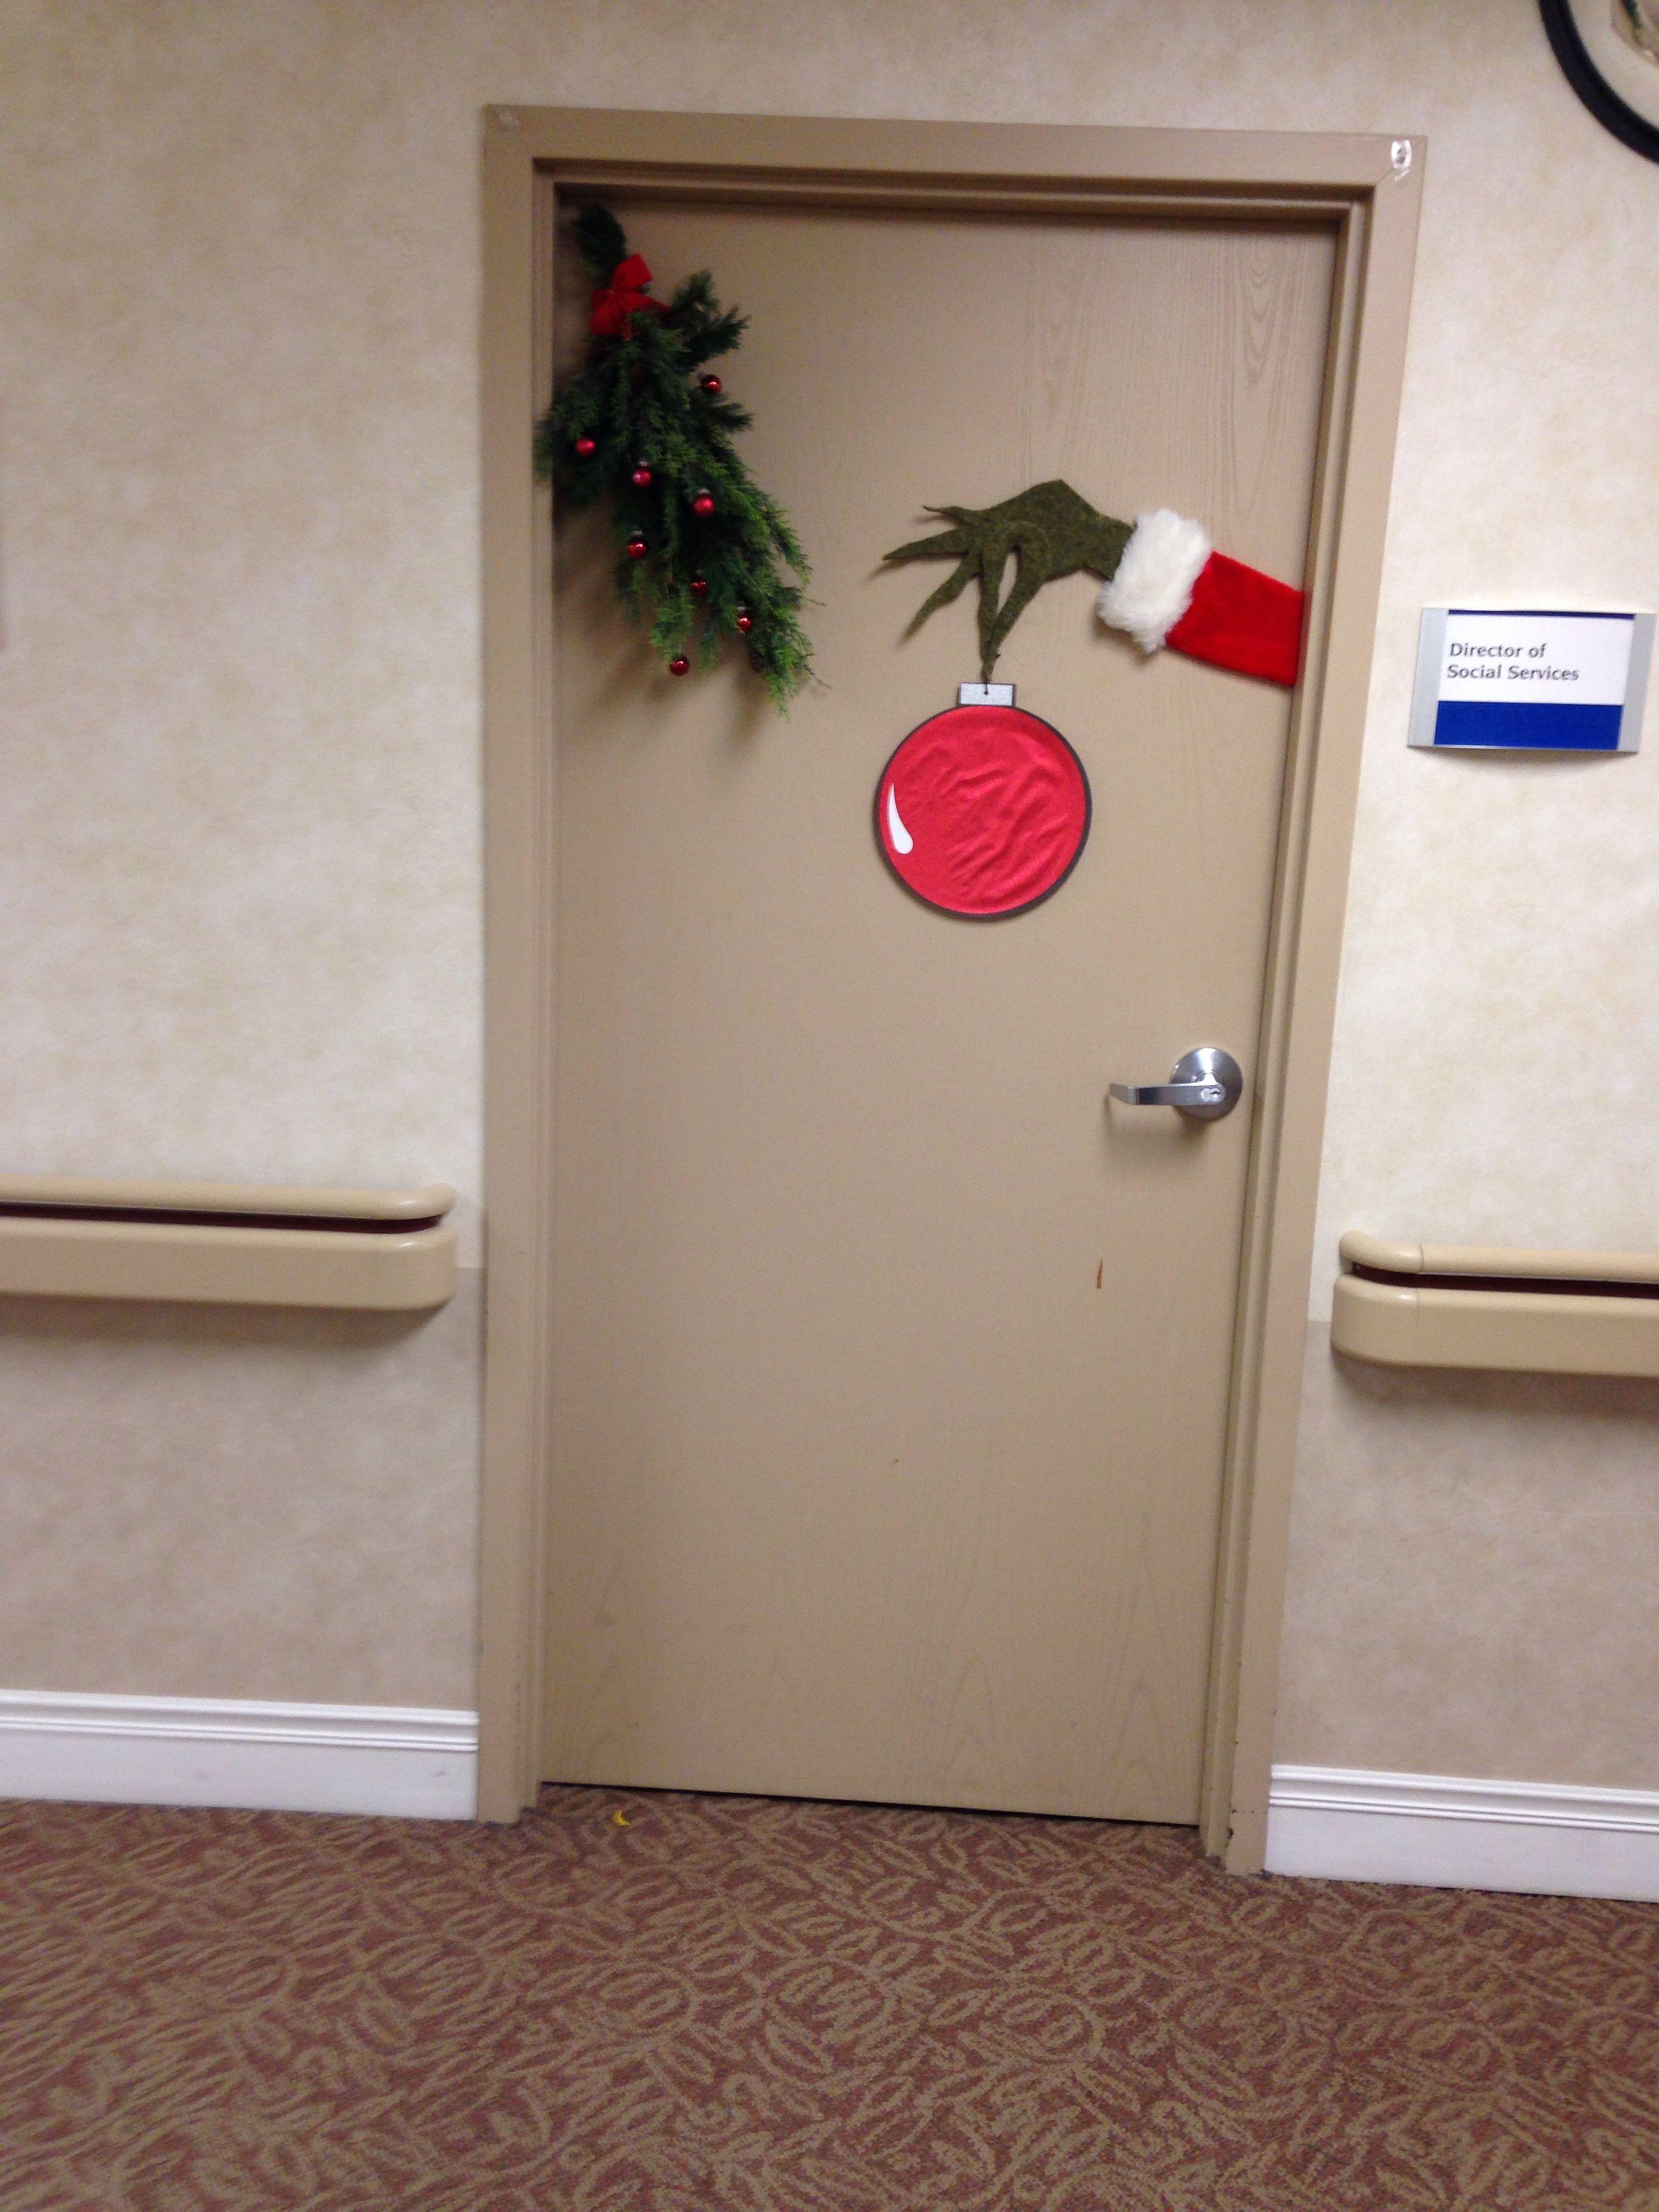 office holiday decor. Grinch Door Decorating · Holiday DecorationsOffice Office Decor S